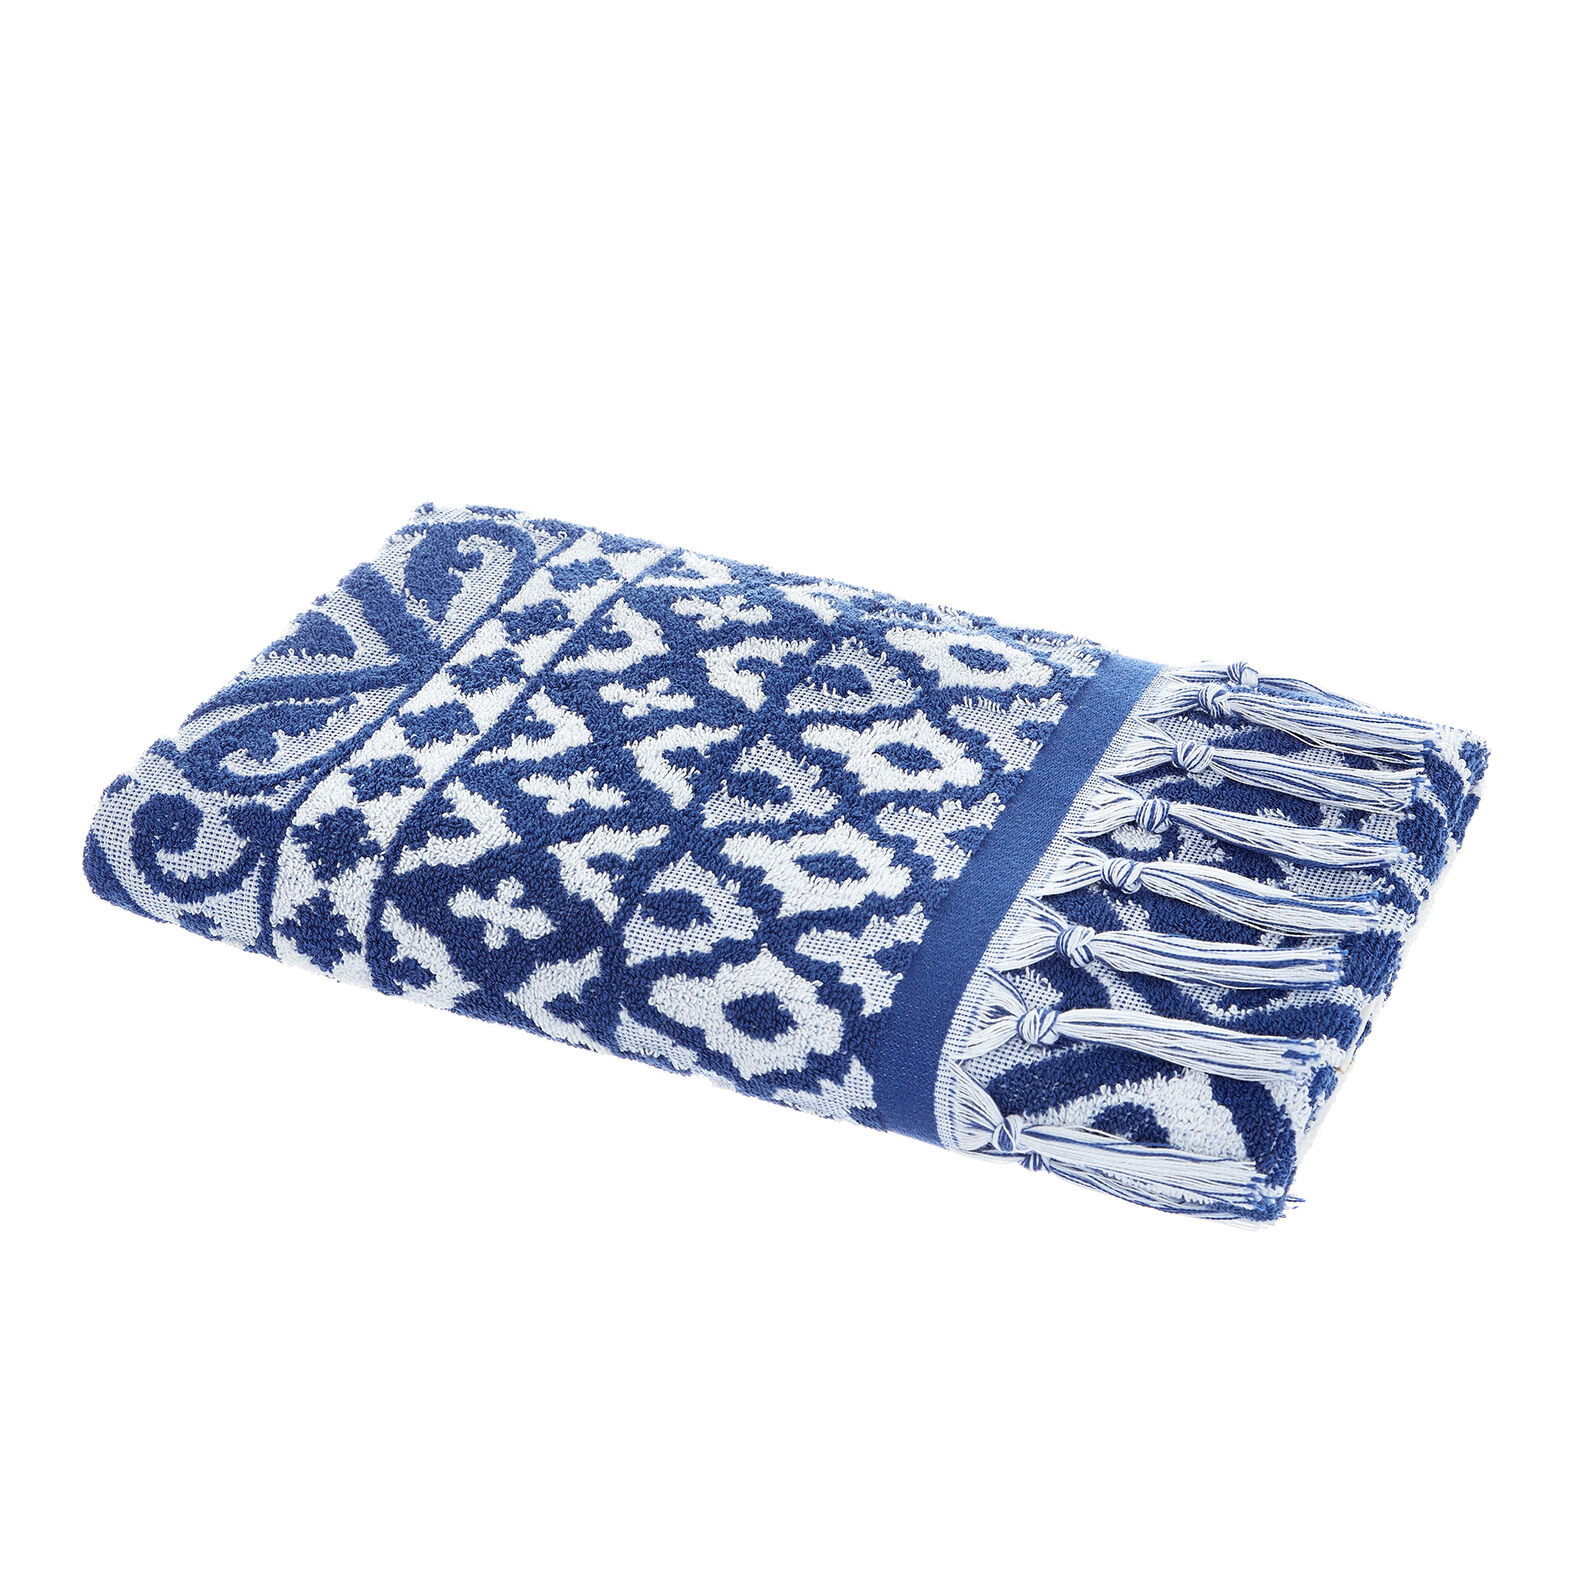 Asciugamano puro cotone jacquard maiolica